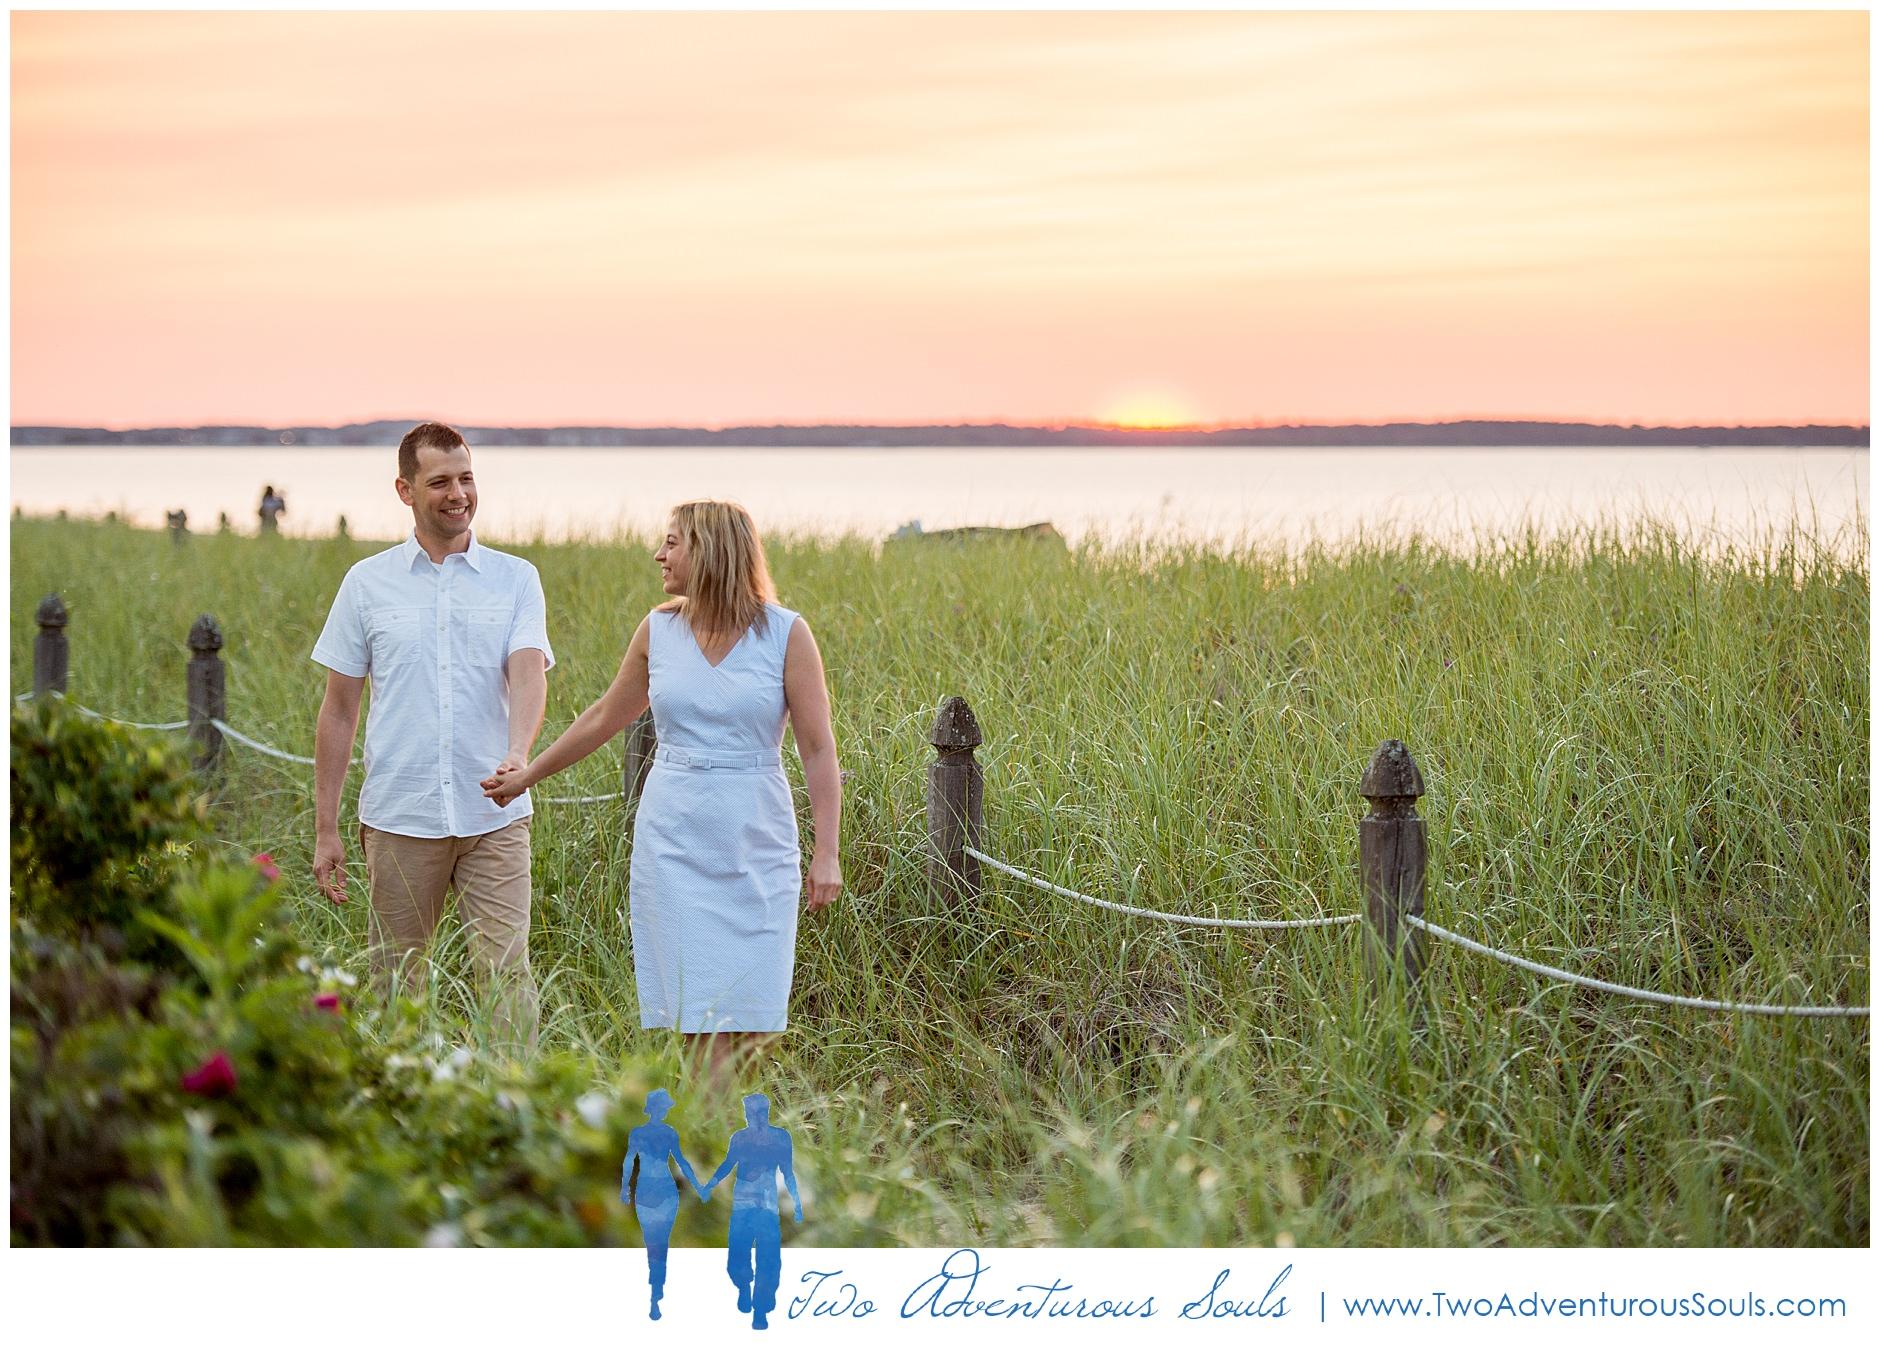 Maine Wedding Photographers, Connecticut Wedding Photographers, Old Orchard Beach Wedding Photographers, Two Adventurous Souls-JustinElise_0009.jpg